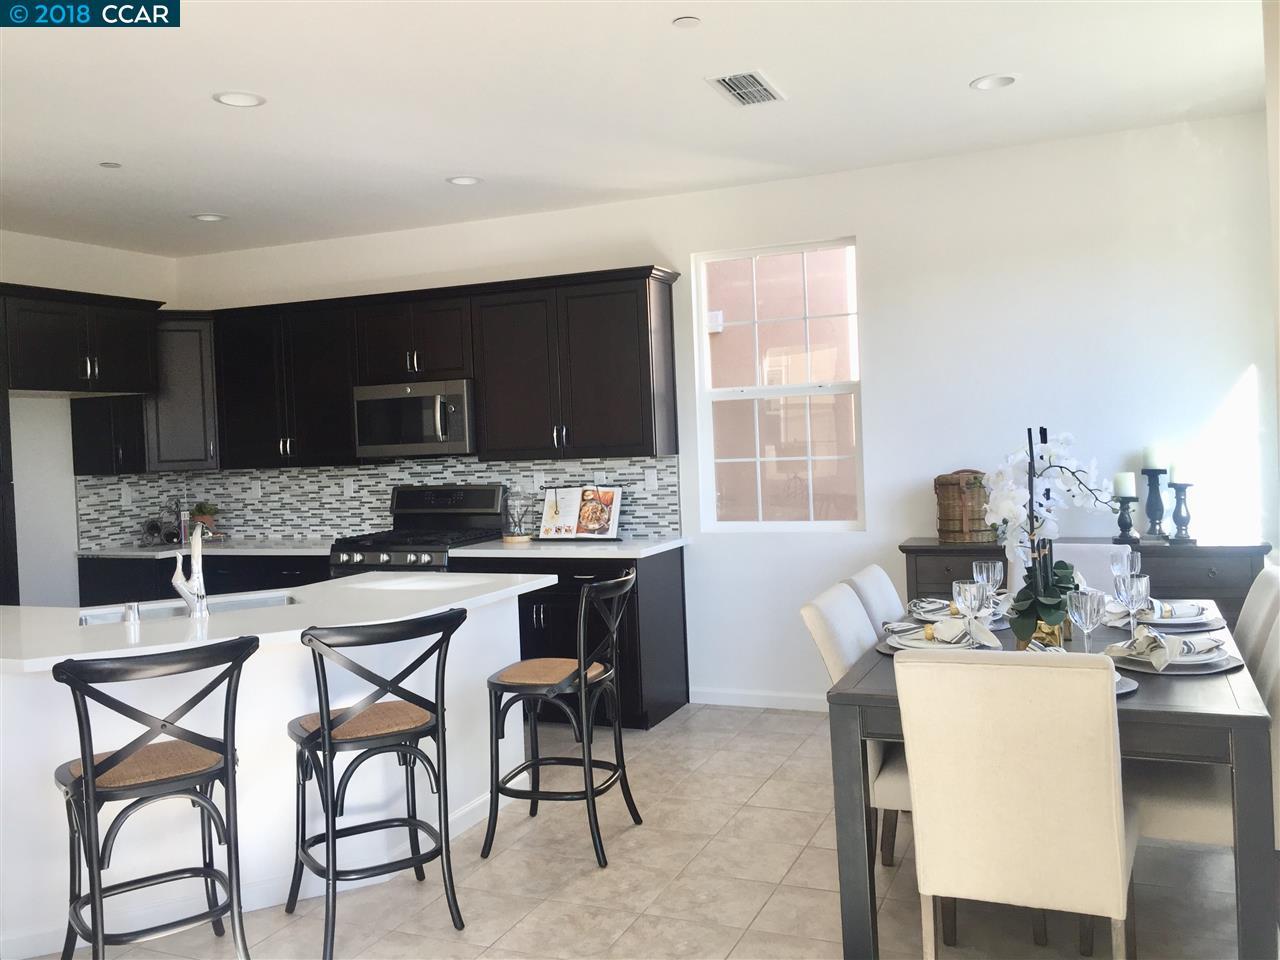 Single Family Home for Sale at 463 Colina Way 463 Colina Way El Sobrante, California 94803 United States